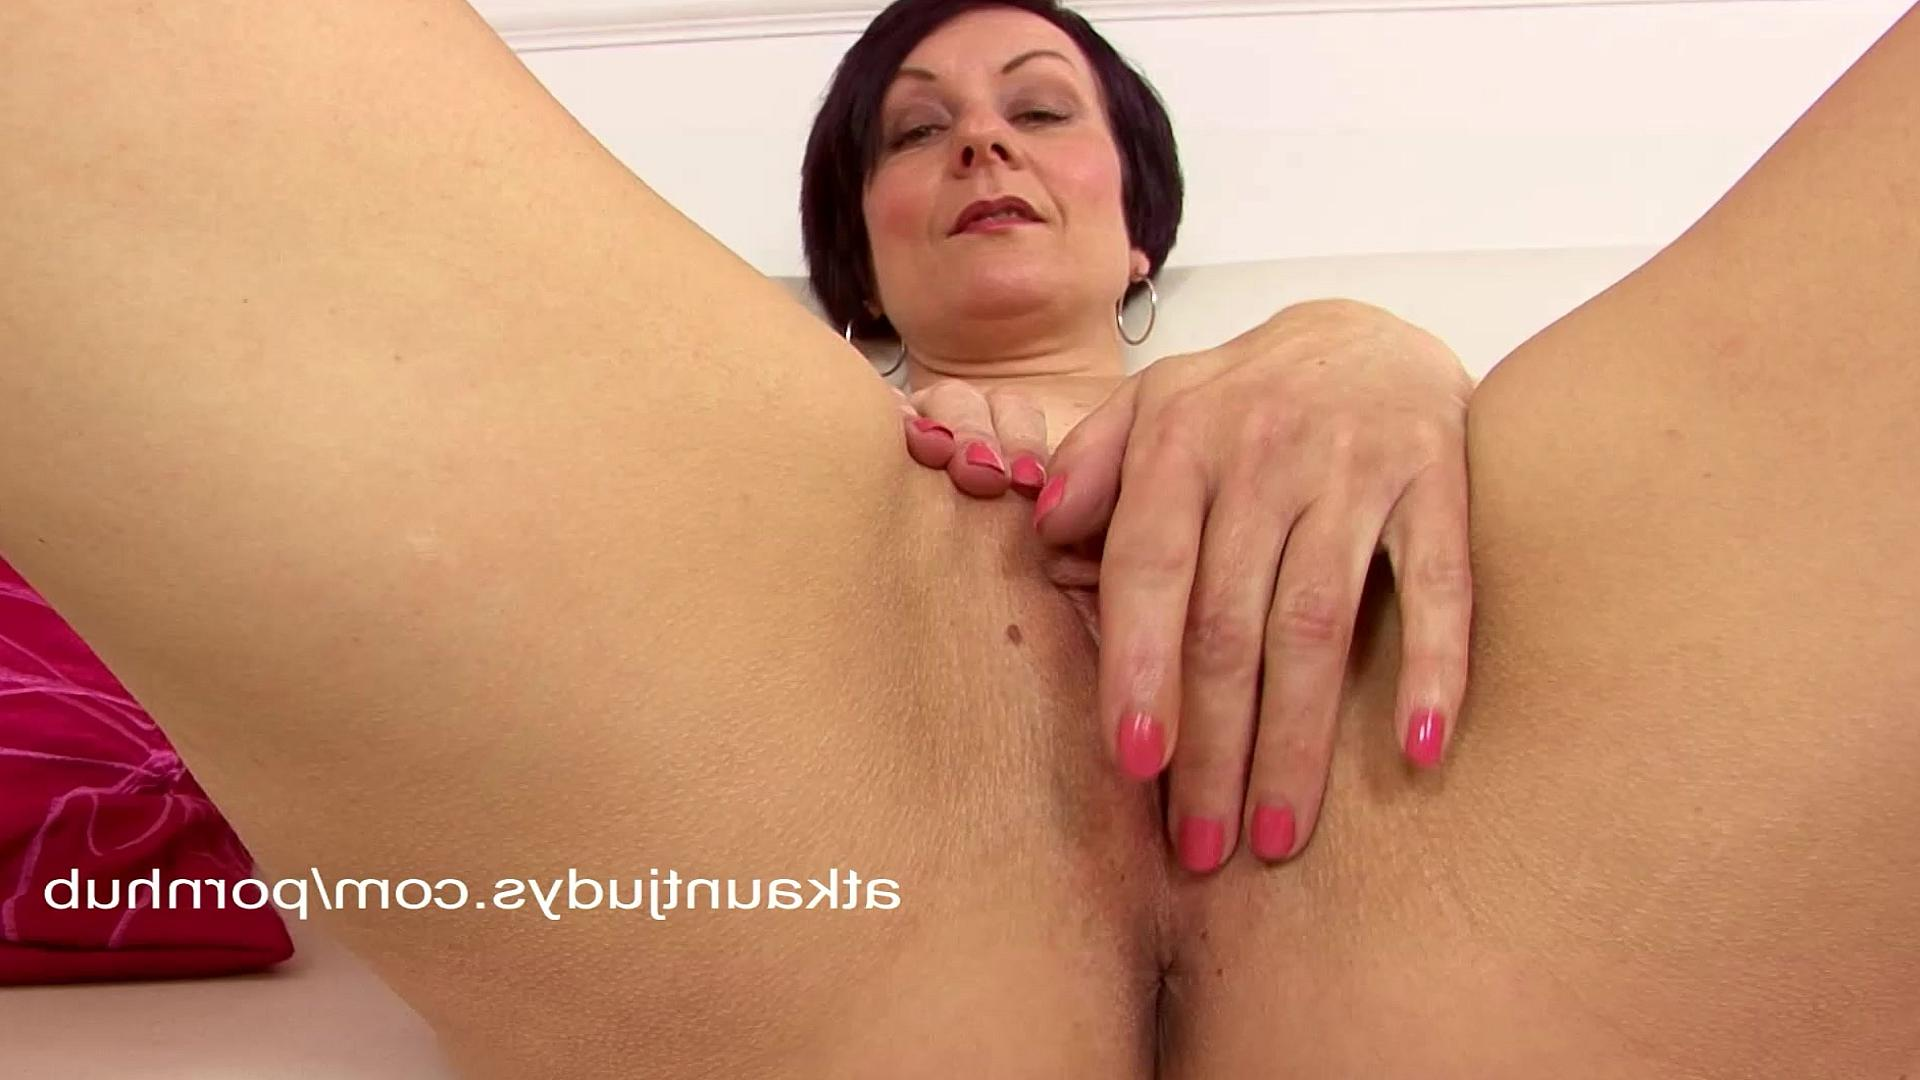 Секс клитар пизда целка видео 7 фотография